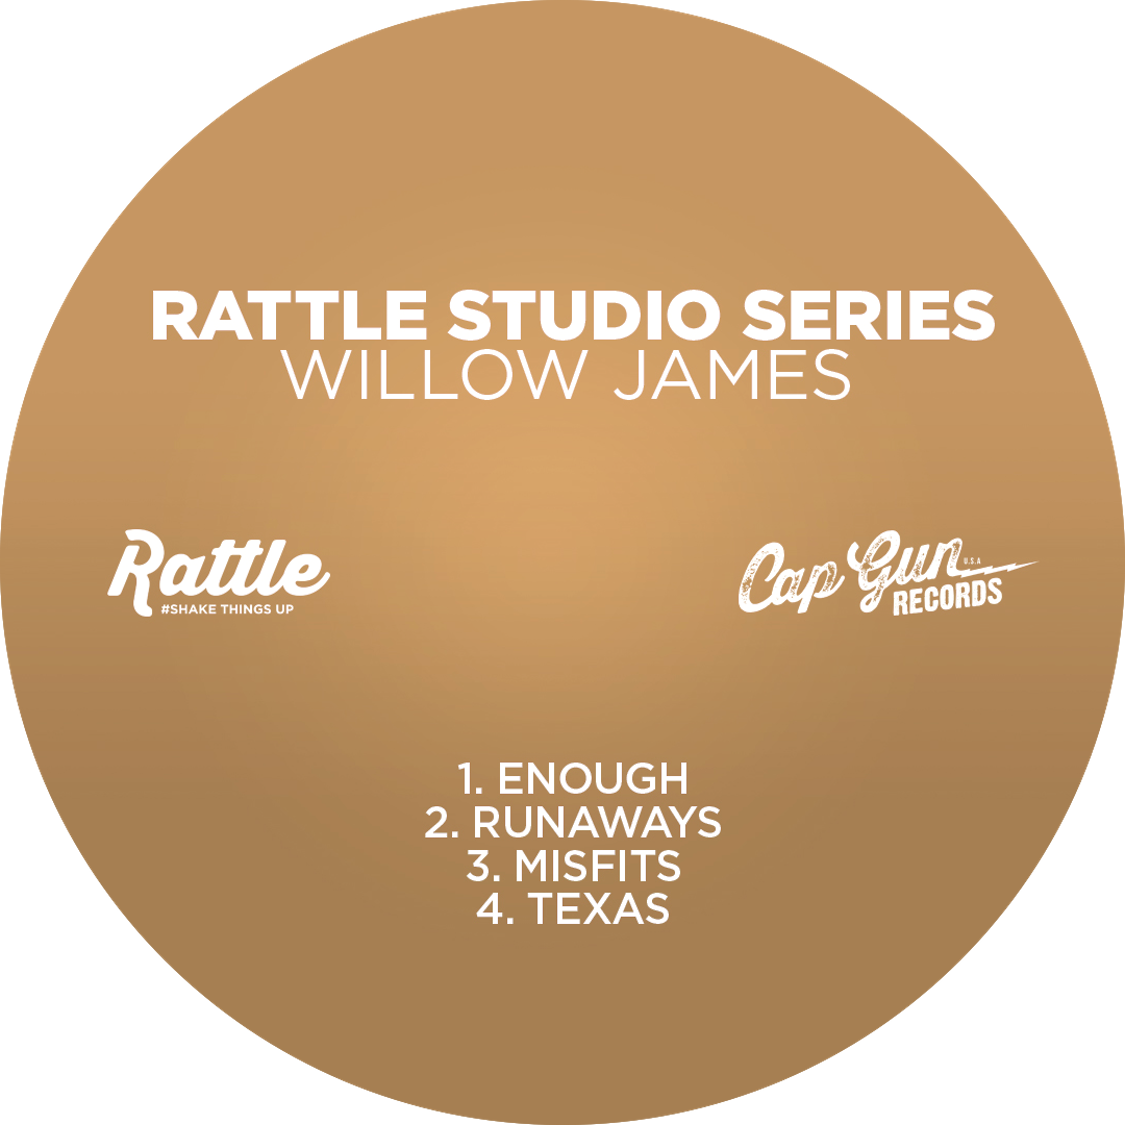 RSS_WillowJames_label copy.png